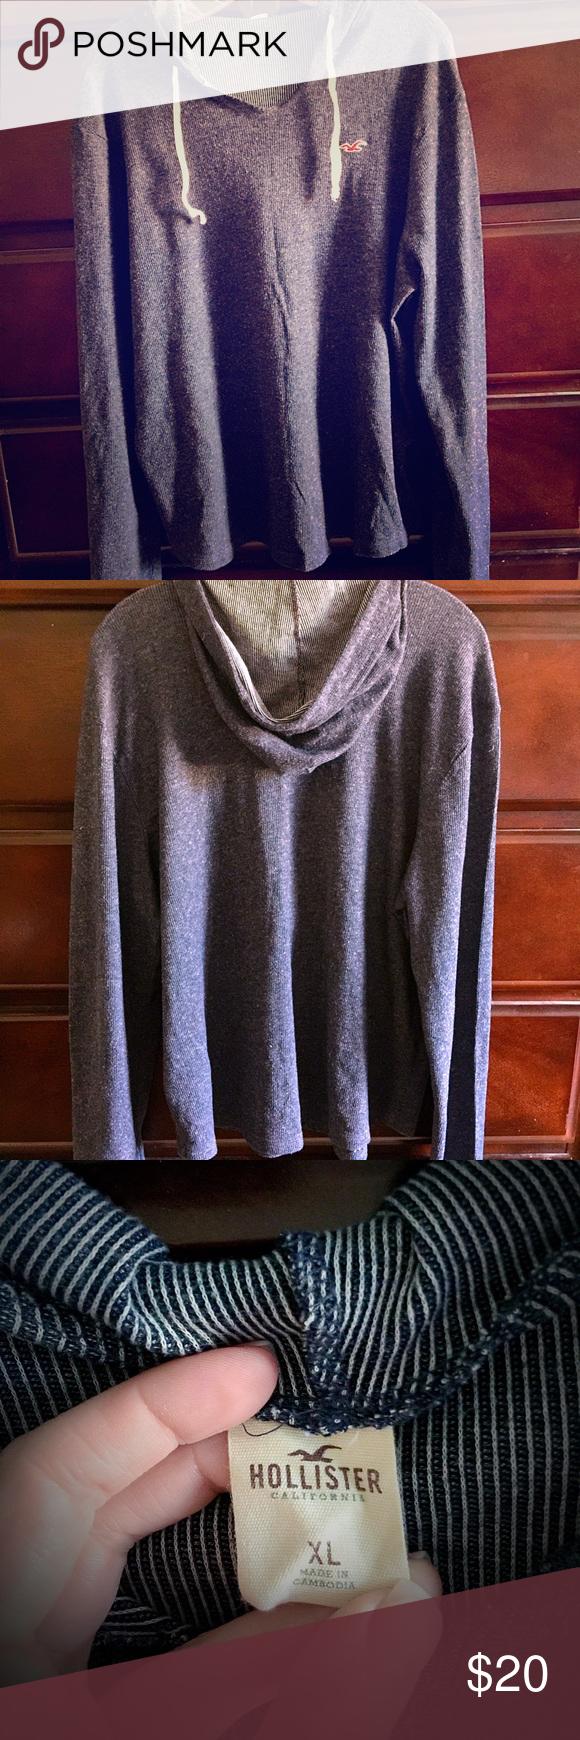 Hollister Blue Light Hoodie Sweater Blue Hollister light sweater hoodie • 58% Cotton 42% Polyester • Does have some pilling, still in EUC. Hollister Tops Sweatshirts & Hoodies